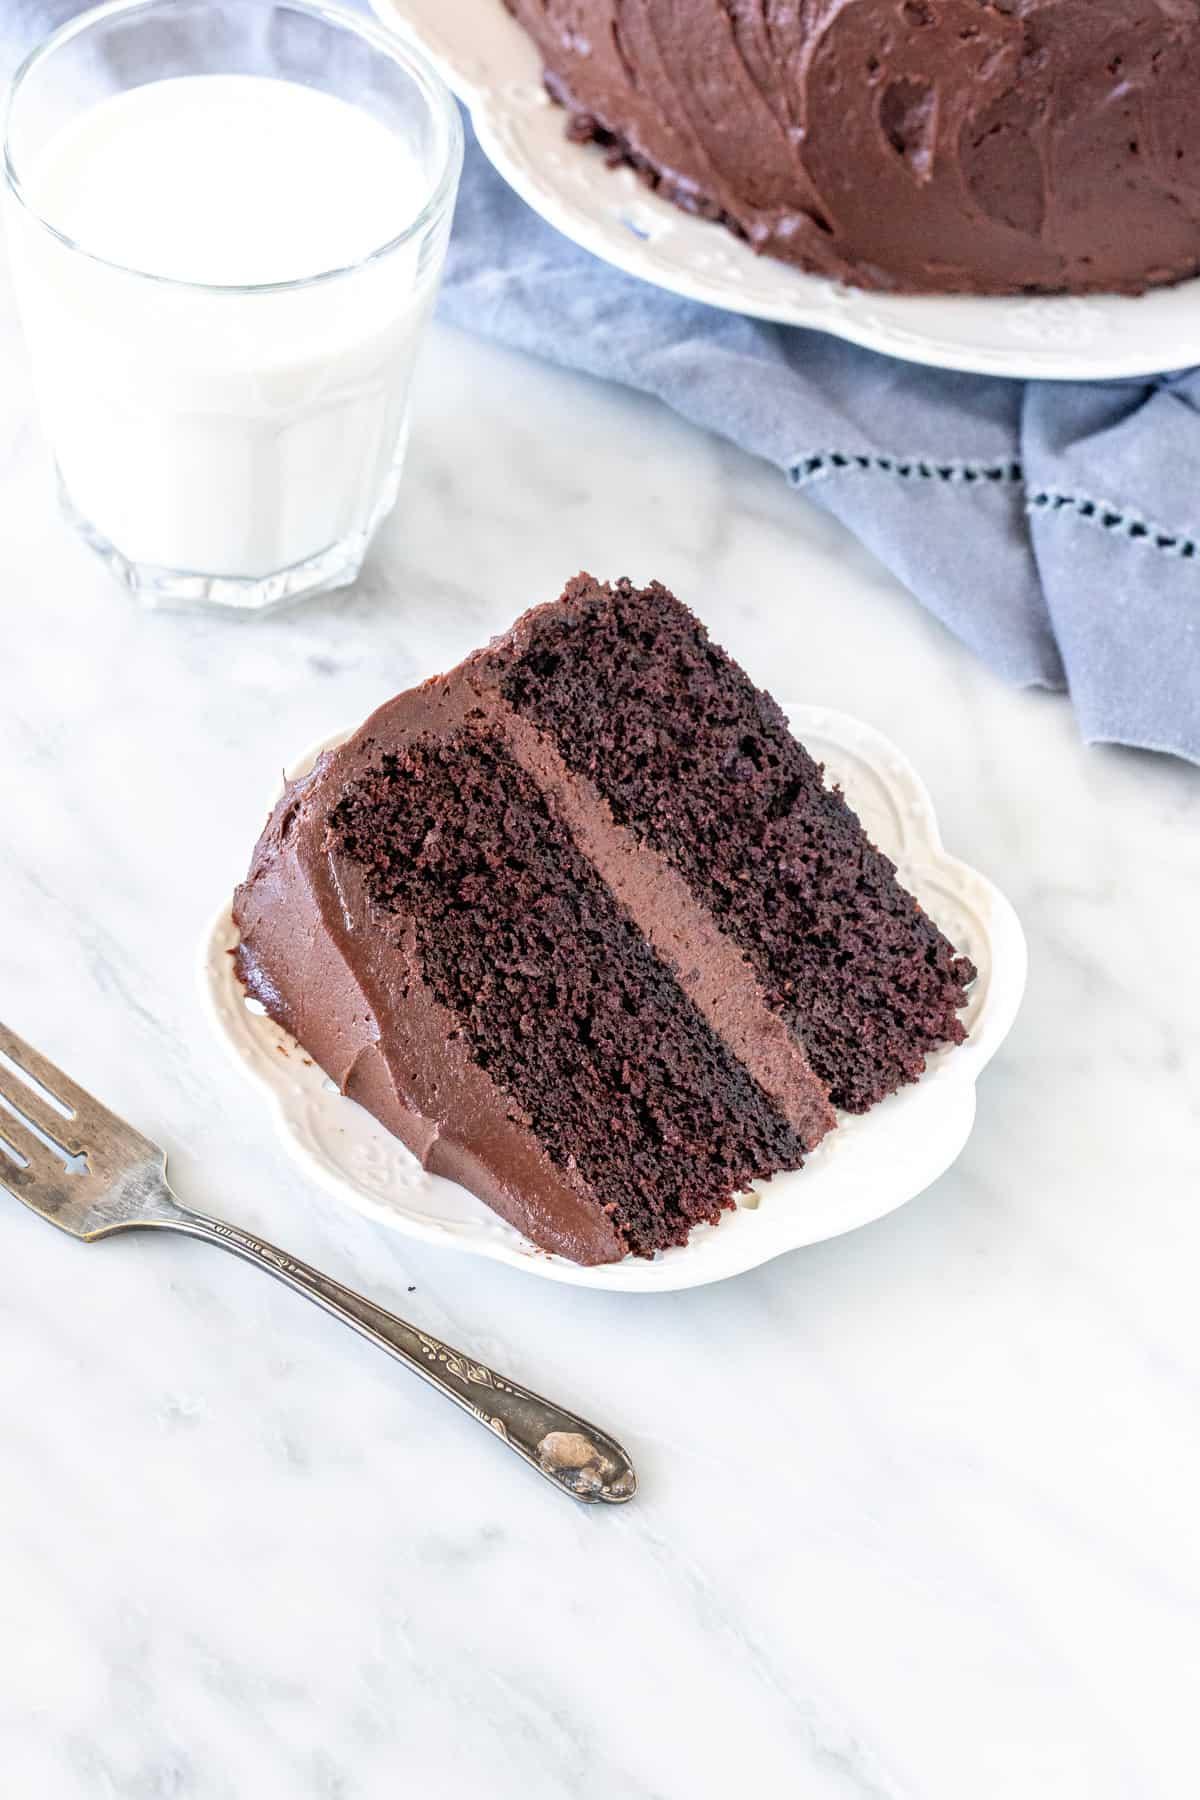 Slice of chocolate cake with chocolate buttercream.